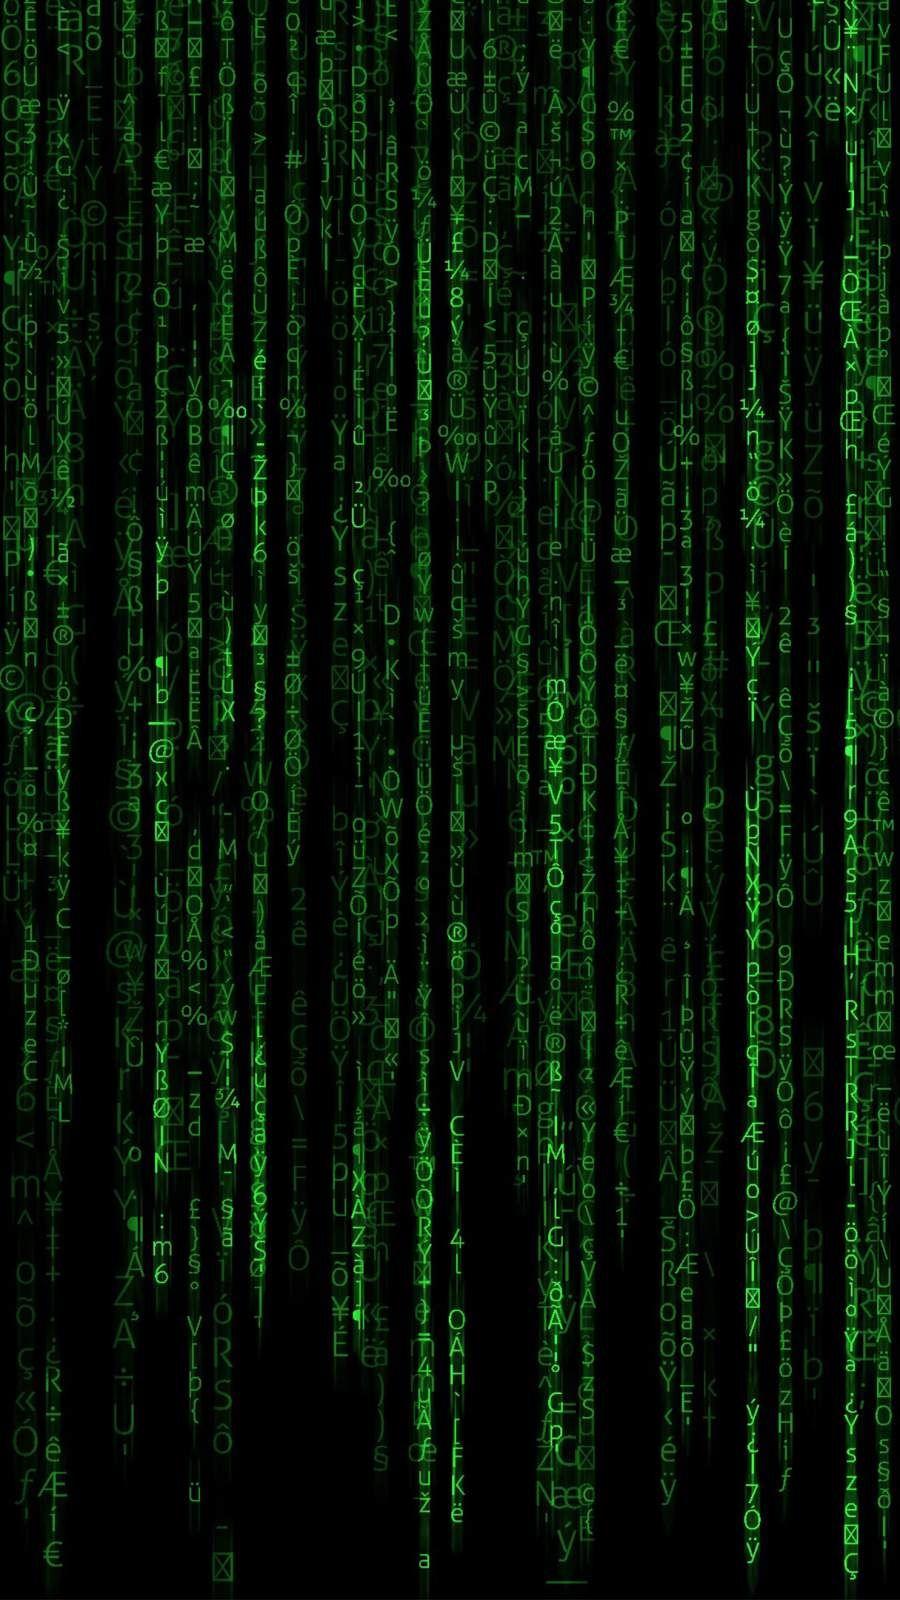 Binary Code Iphone Wallpaper In 2020 Iphone Background Wallpaper Iphone Wallpaper Iphone Wallpaper Images